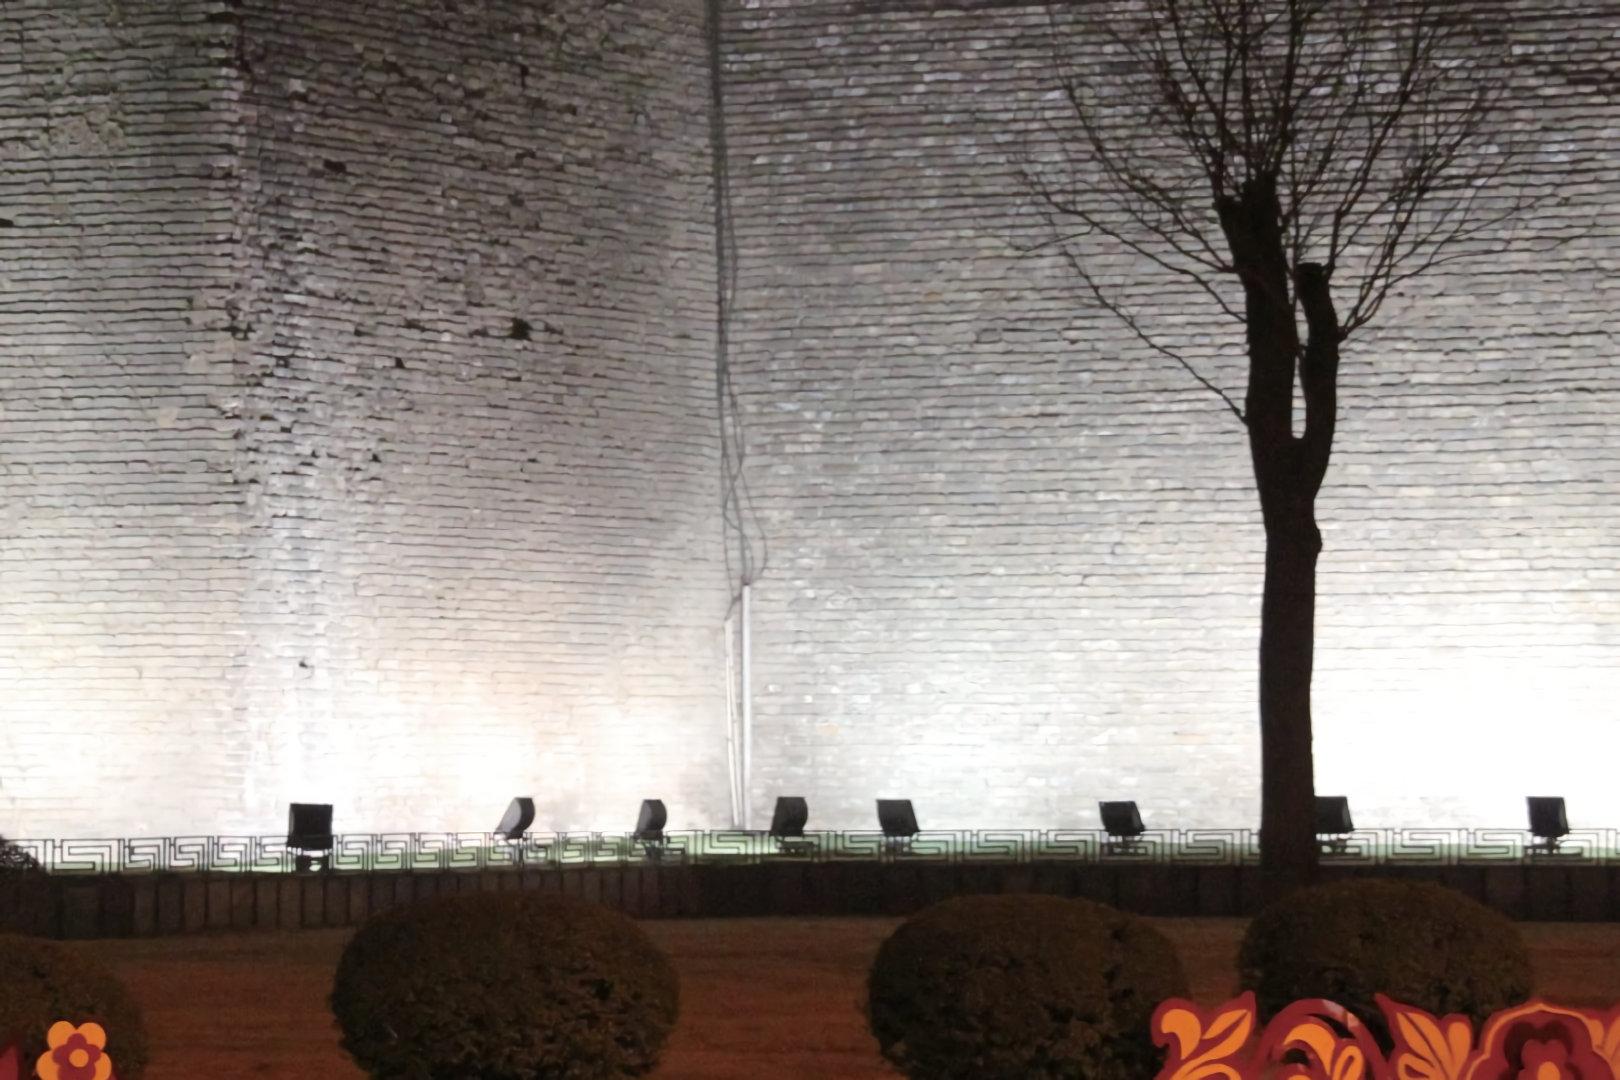 microngroup-up-lighting-wall-with-led-lights